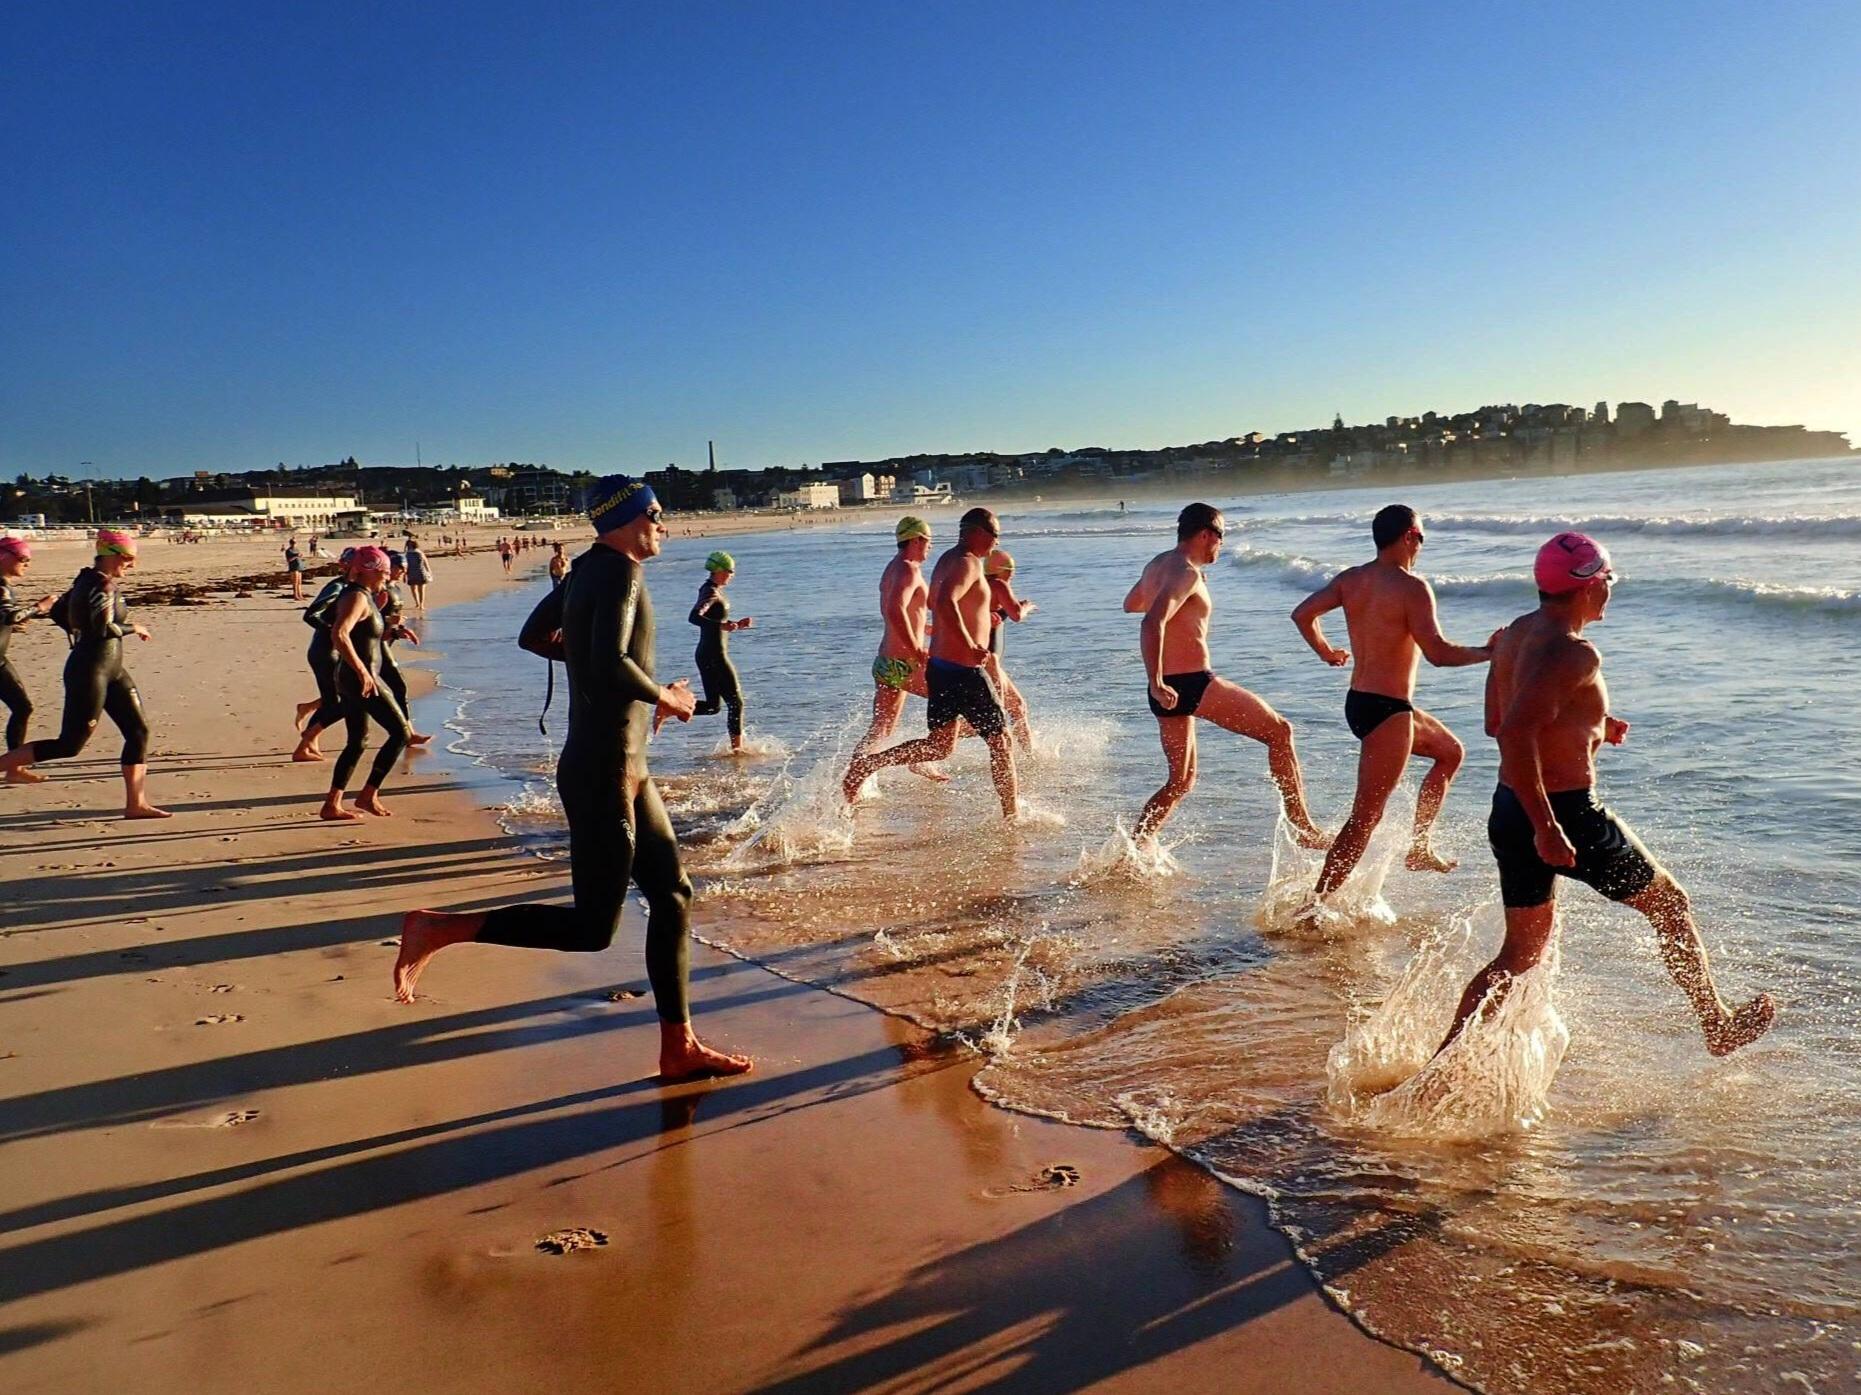 Sunrise+Surf+Run+into+water